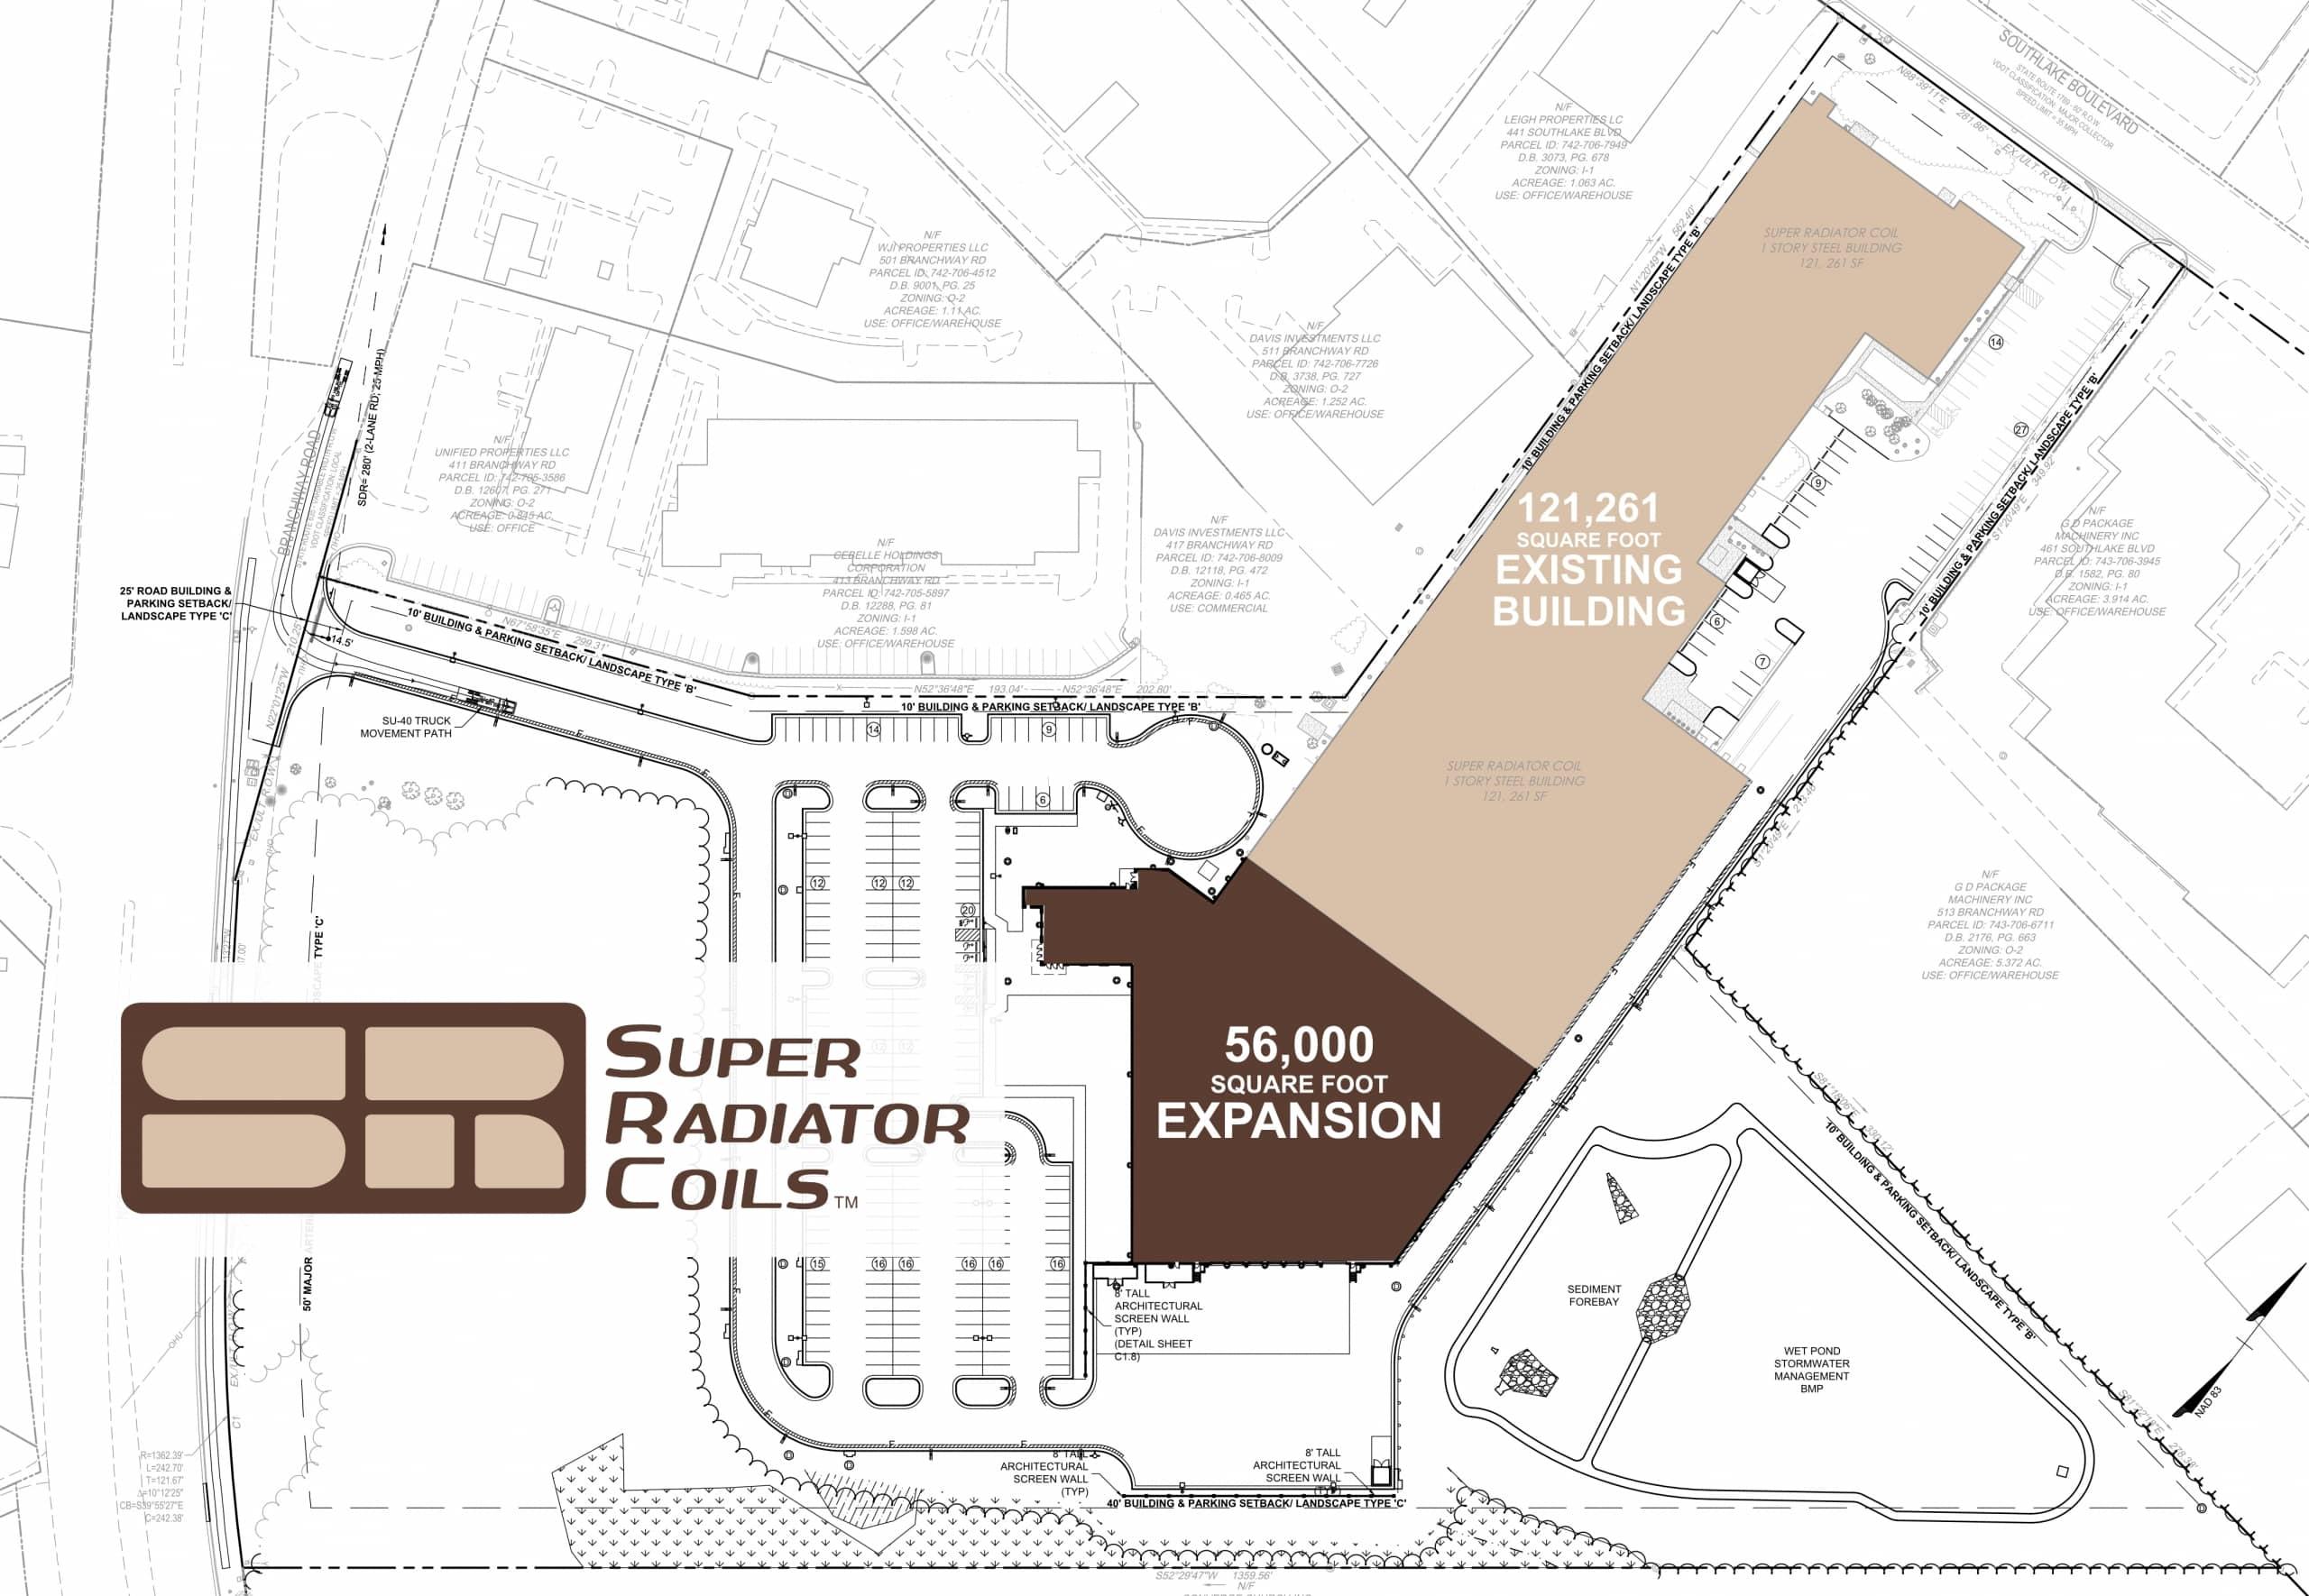 blueprint of super radiator coils expansion